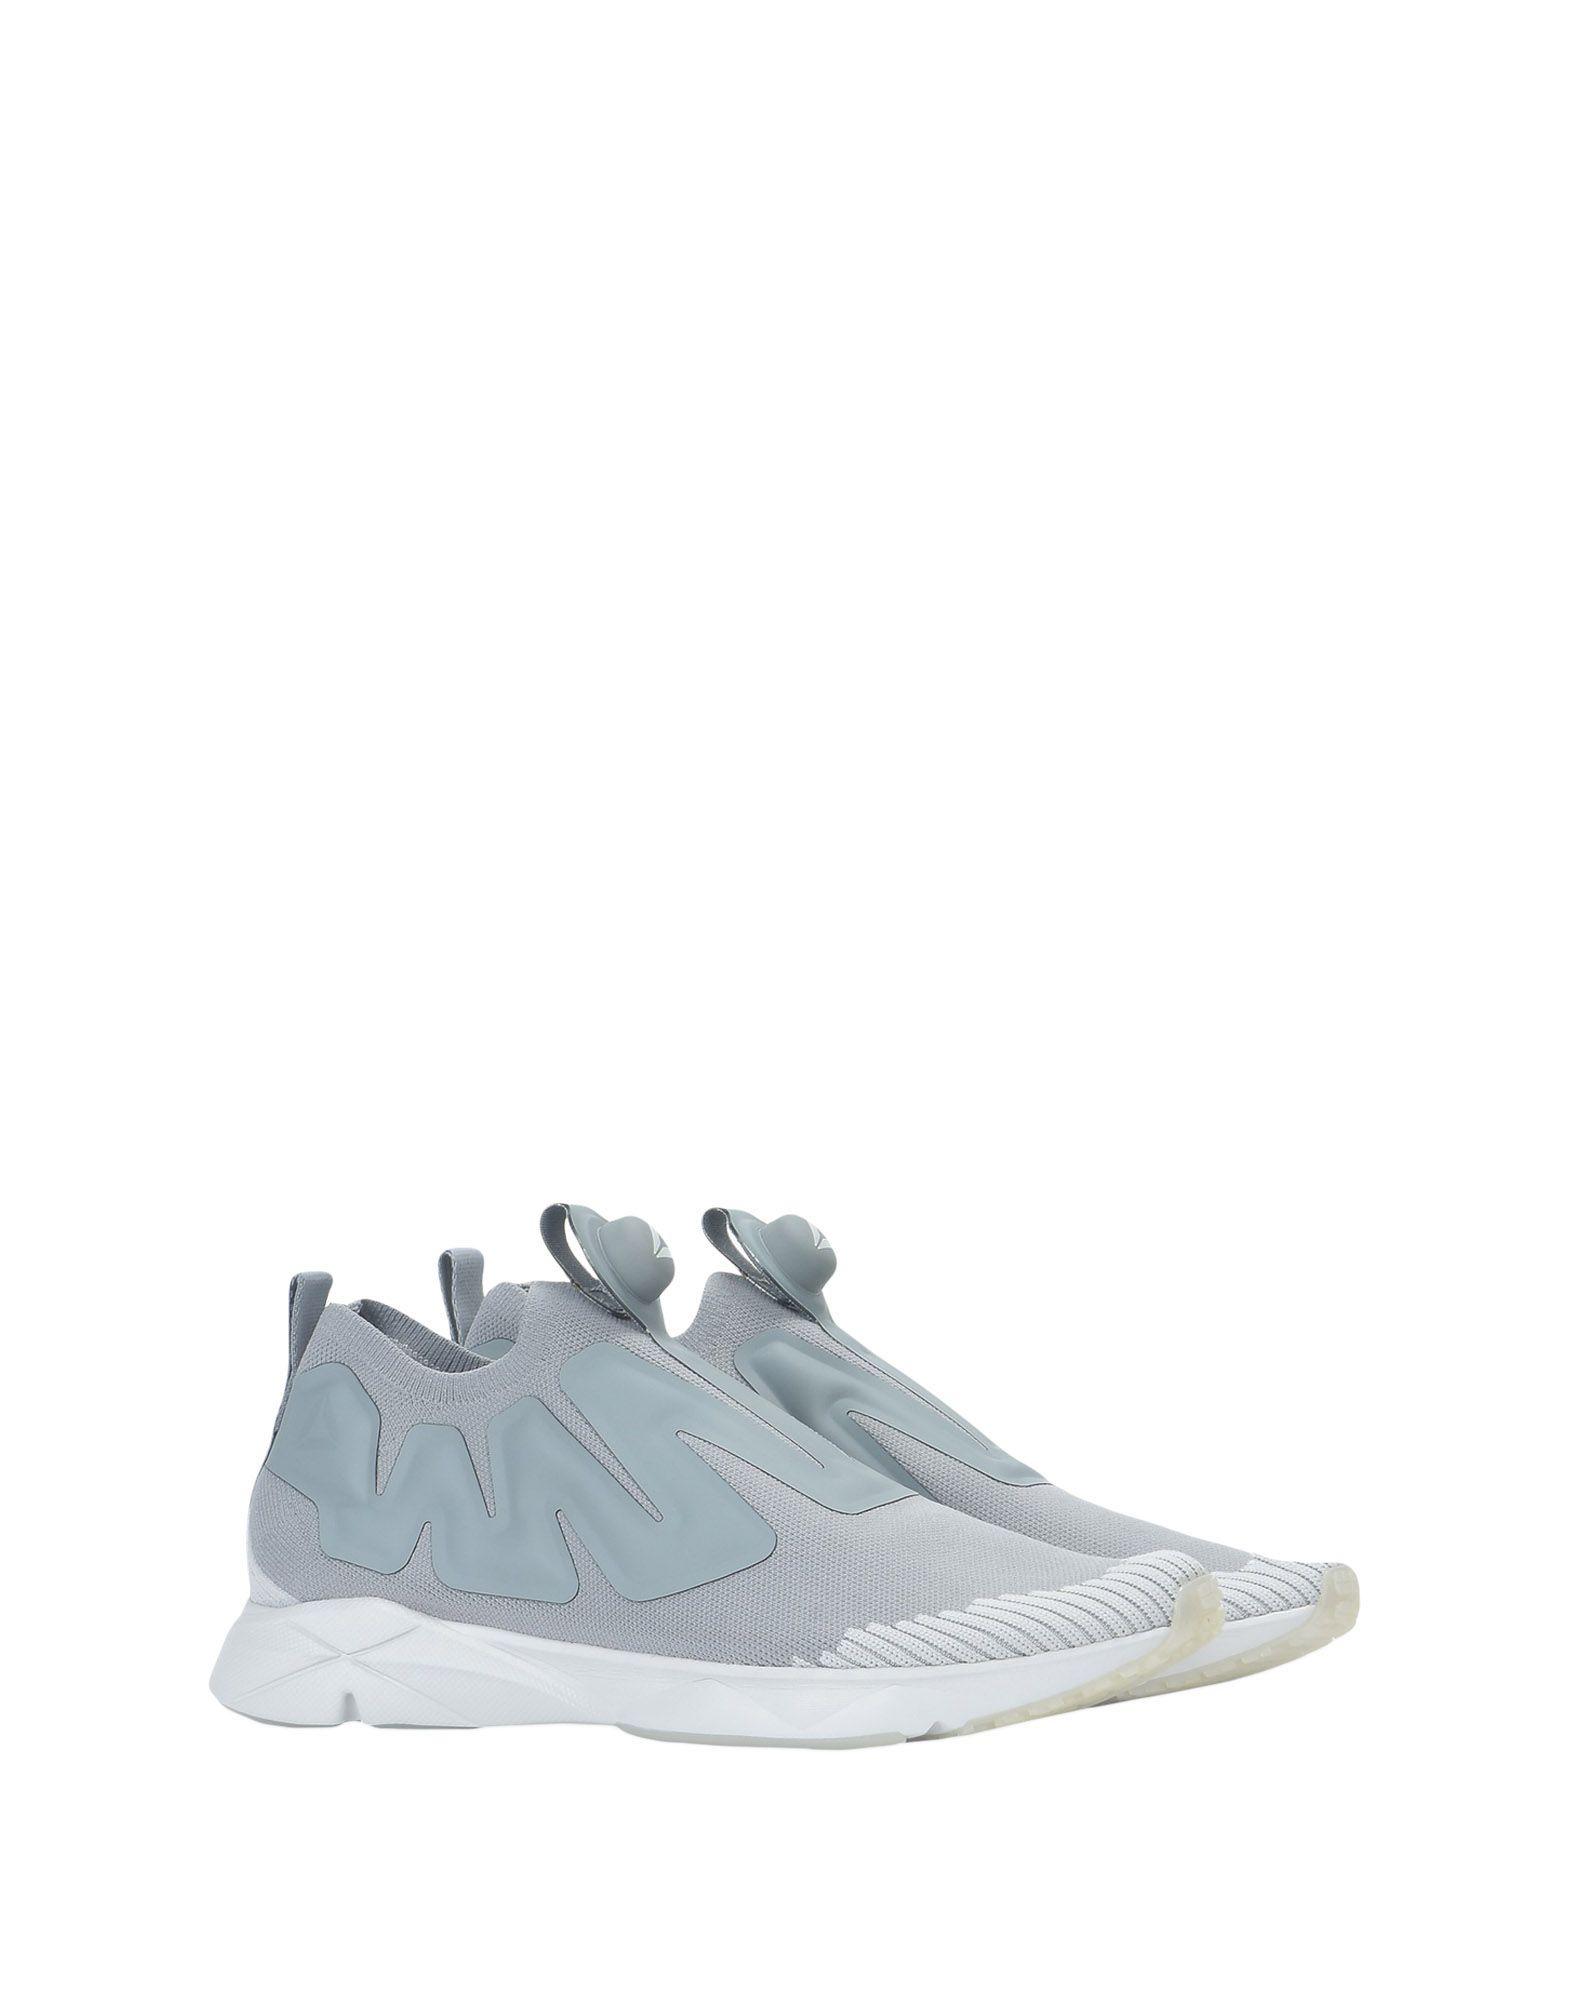 Reebok Reebok Pump Supreme  11495327AS Gute Qualität beliebte Schuhe